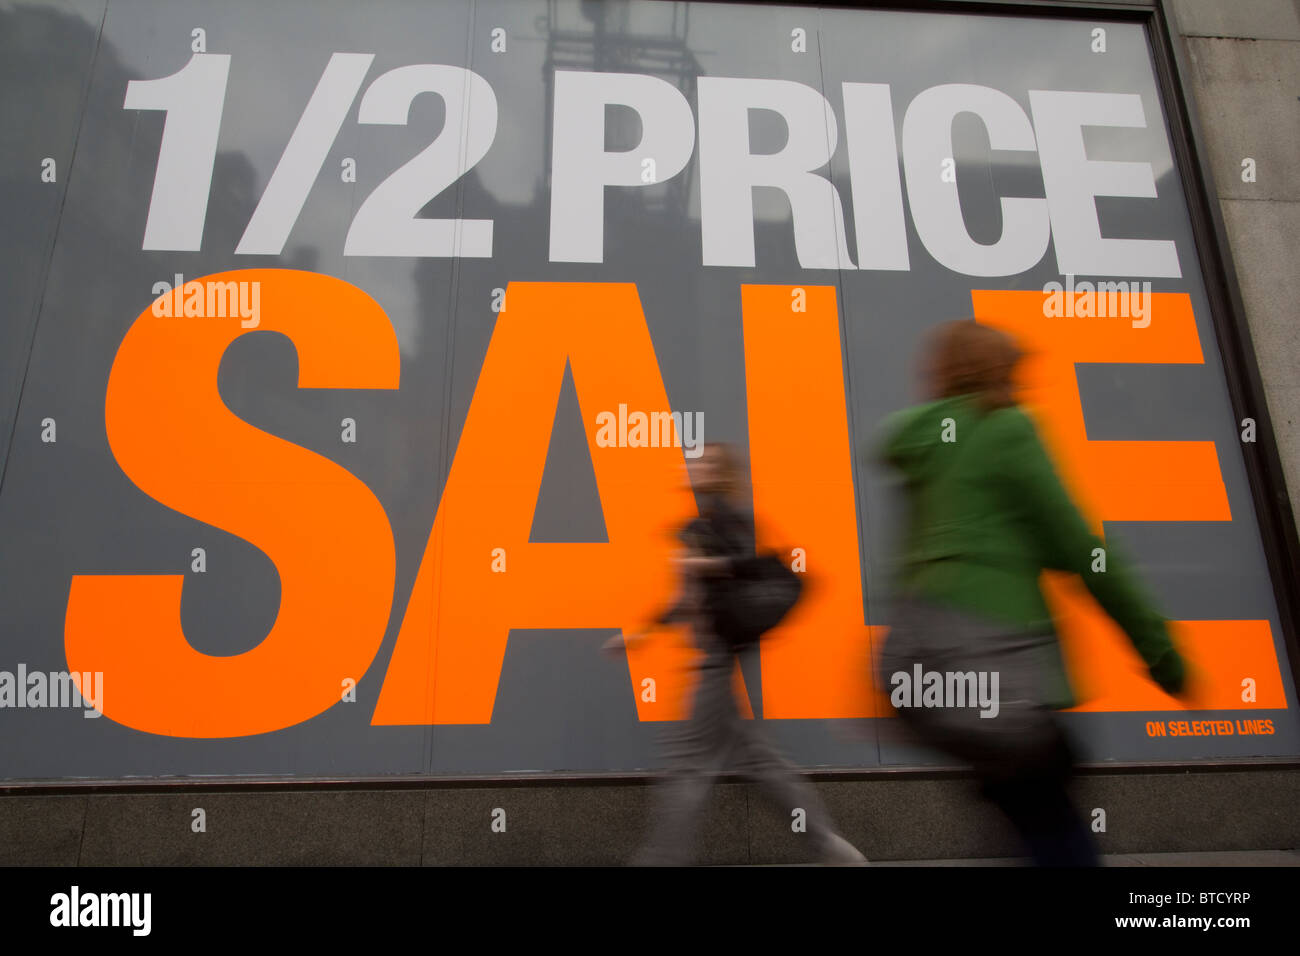 Huge Sale sign Oxford Street - Stock Image